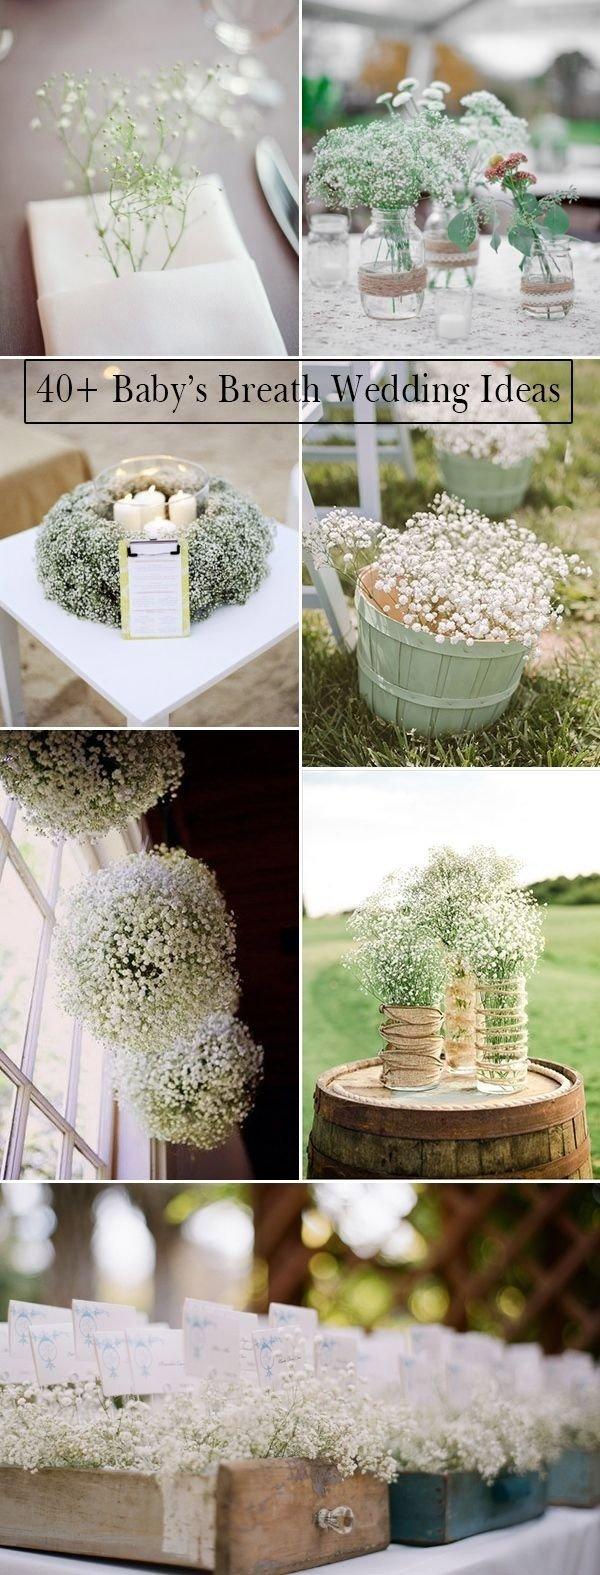 10 Pretty Creative Wedding Ideas On A Budget 45 best wedding images on pinterest creative ideas ideas para 2020